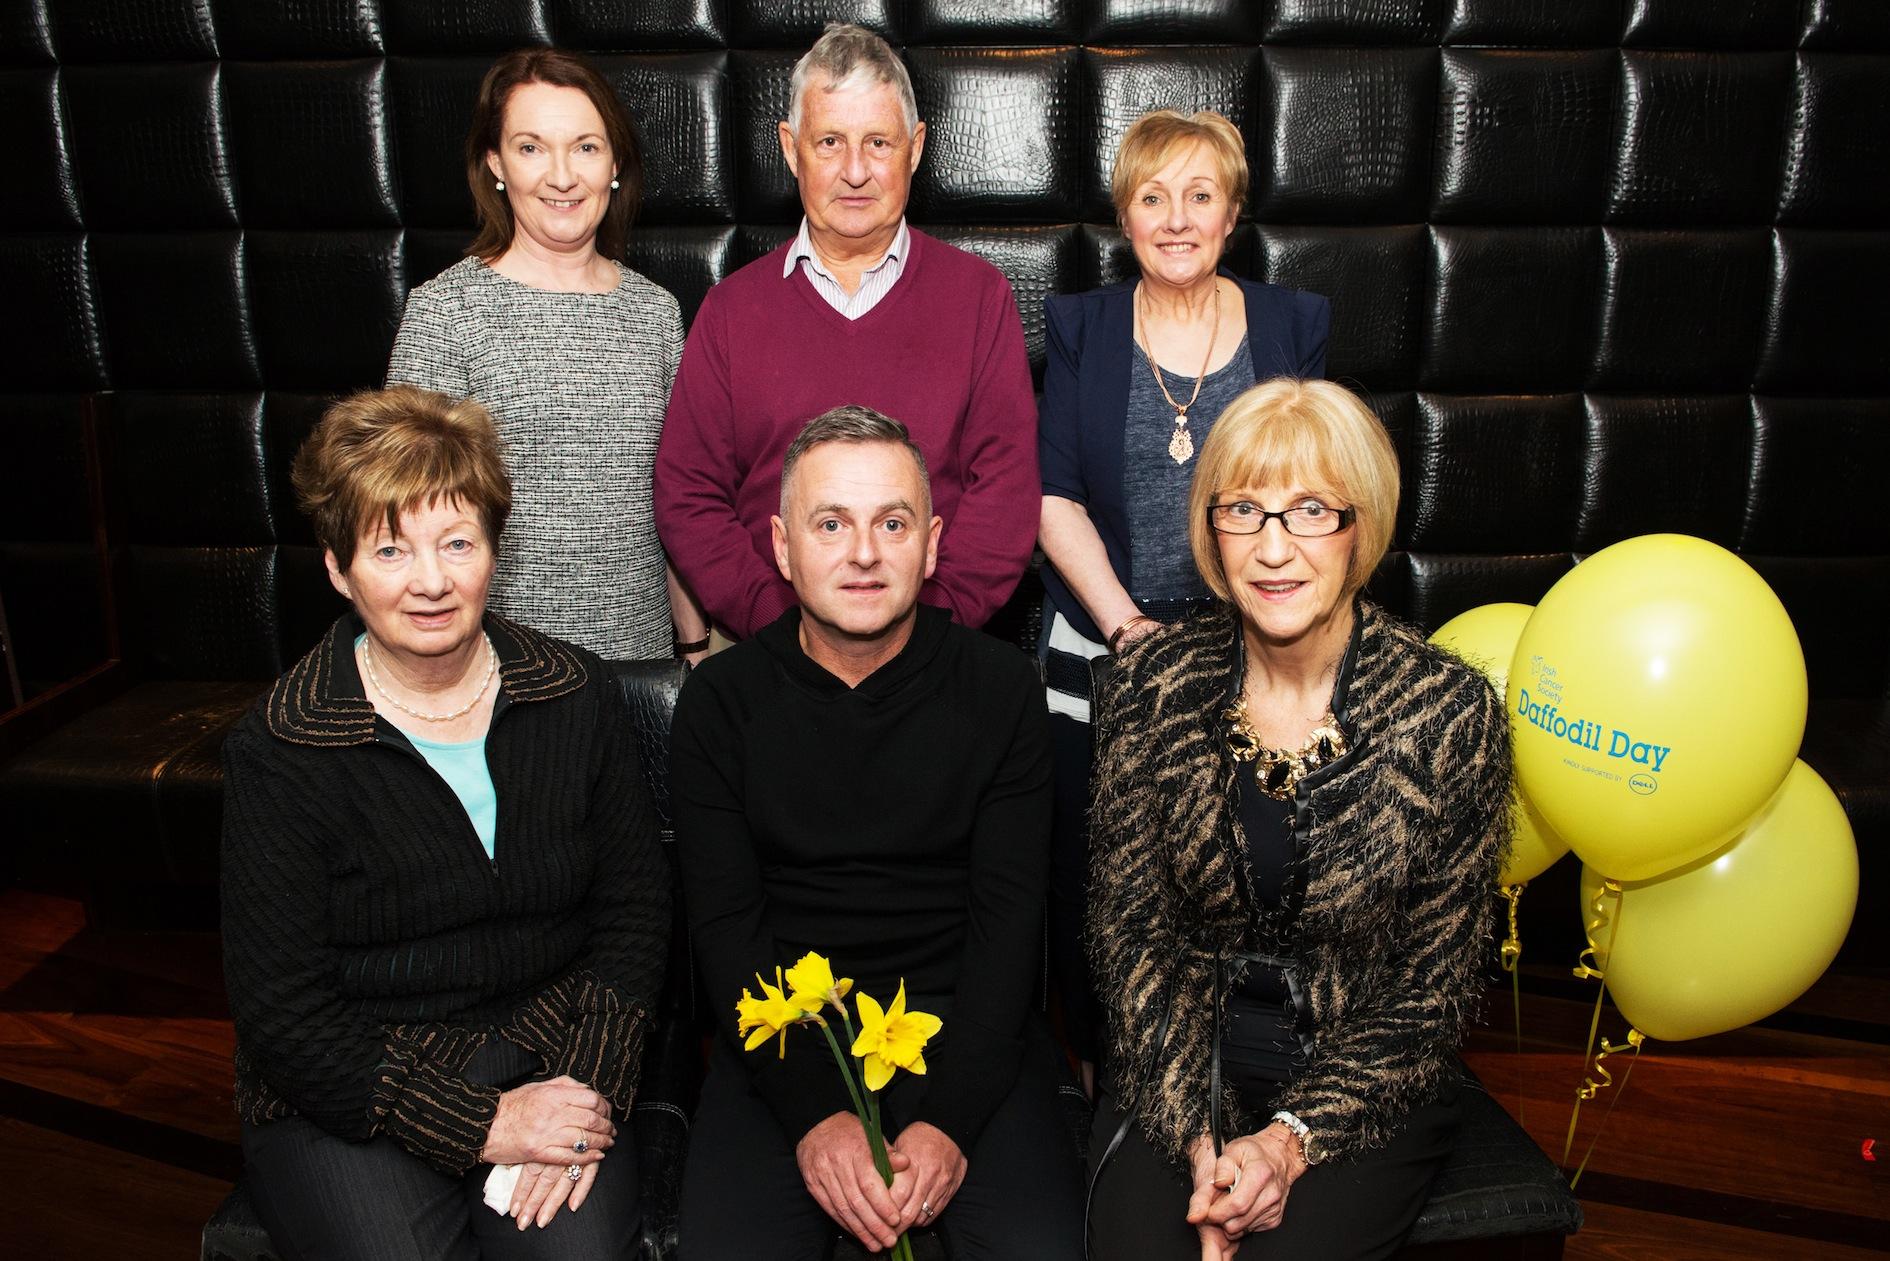 The committee of the Killarney and South Kerry Branch of the Irish Cancer Society Kathleen O'Shea (treasurer), Eugene O'Sullivan (chairman), Kathrina Breen (secretary); back,Eleanor O'Doherty, Timmy Moriarty and Kathleen Cronin. PICTURE: MAREK HAJDASZ (MHPHOTOS.IE)